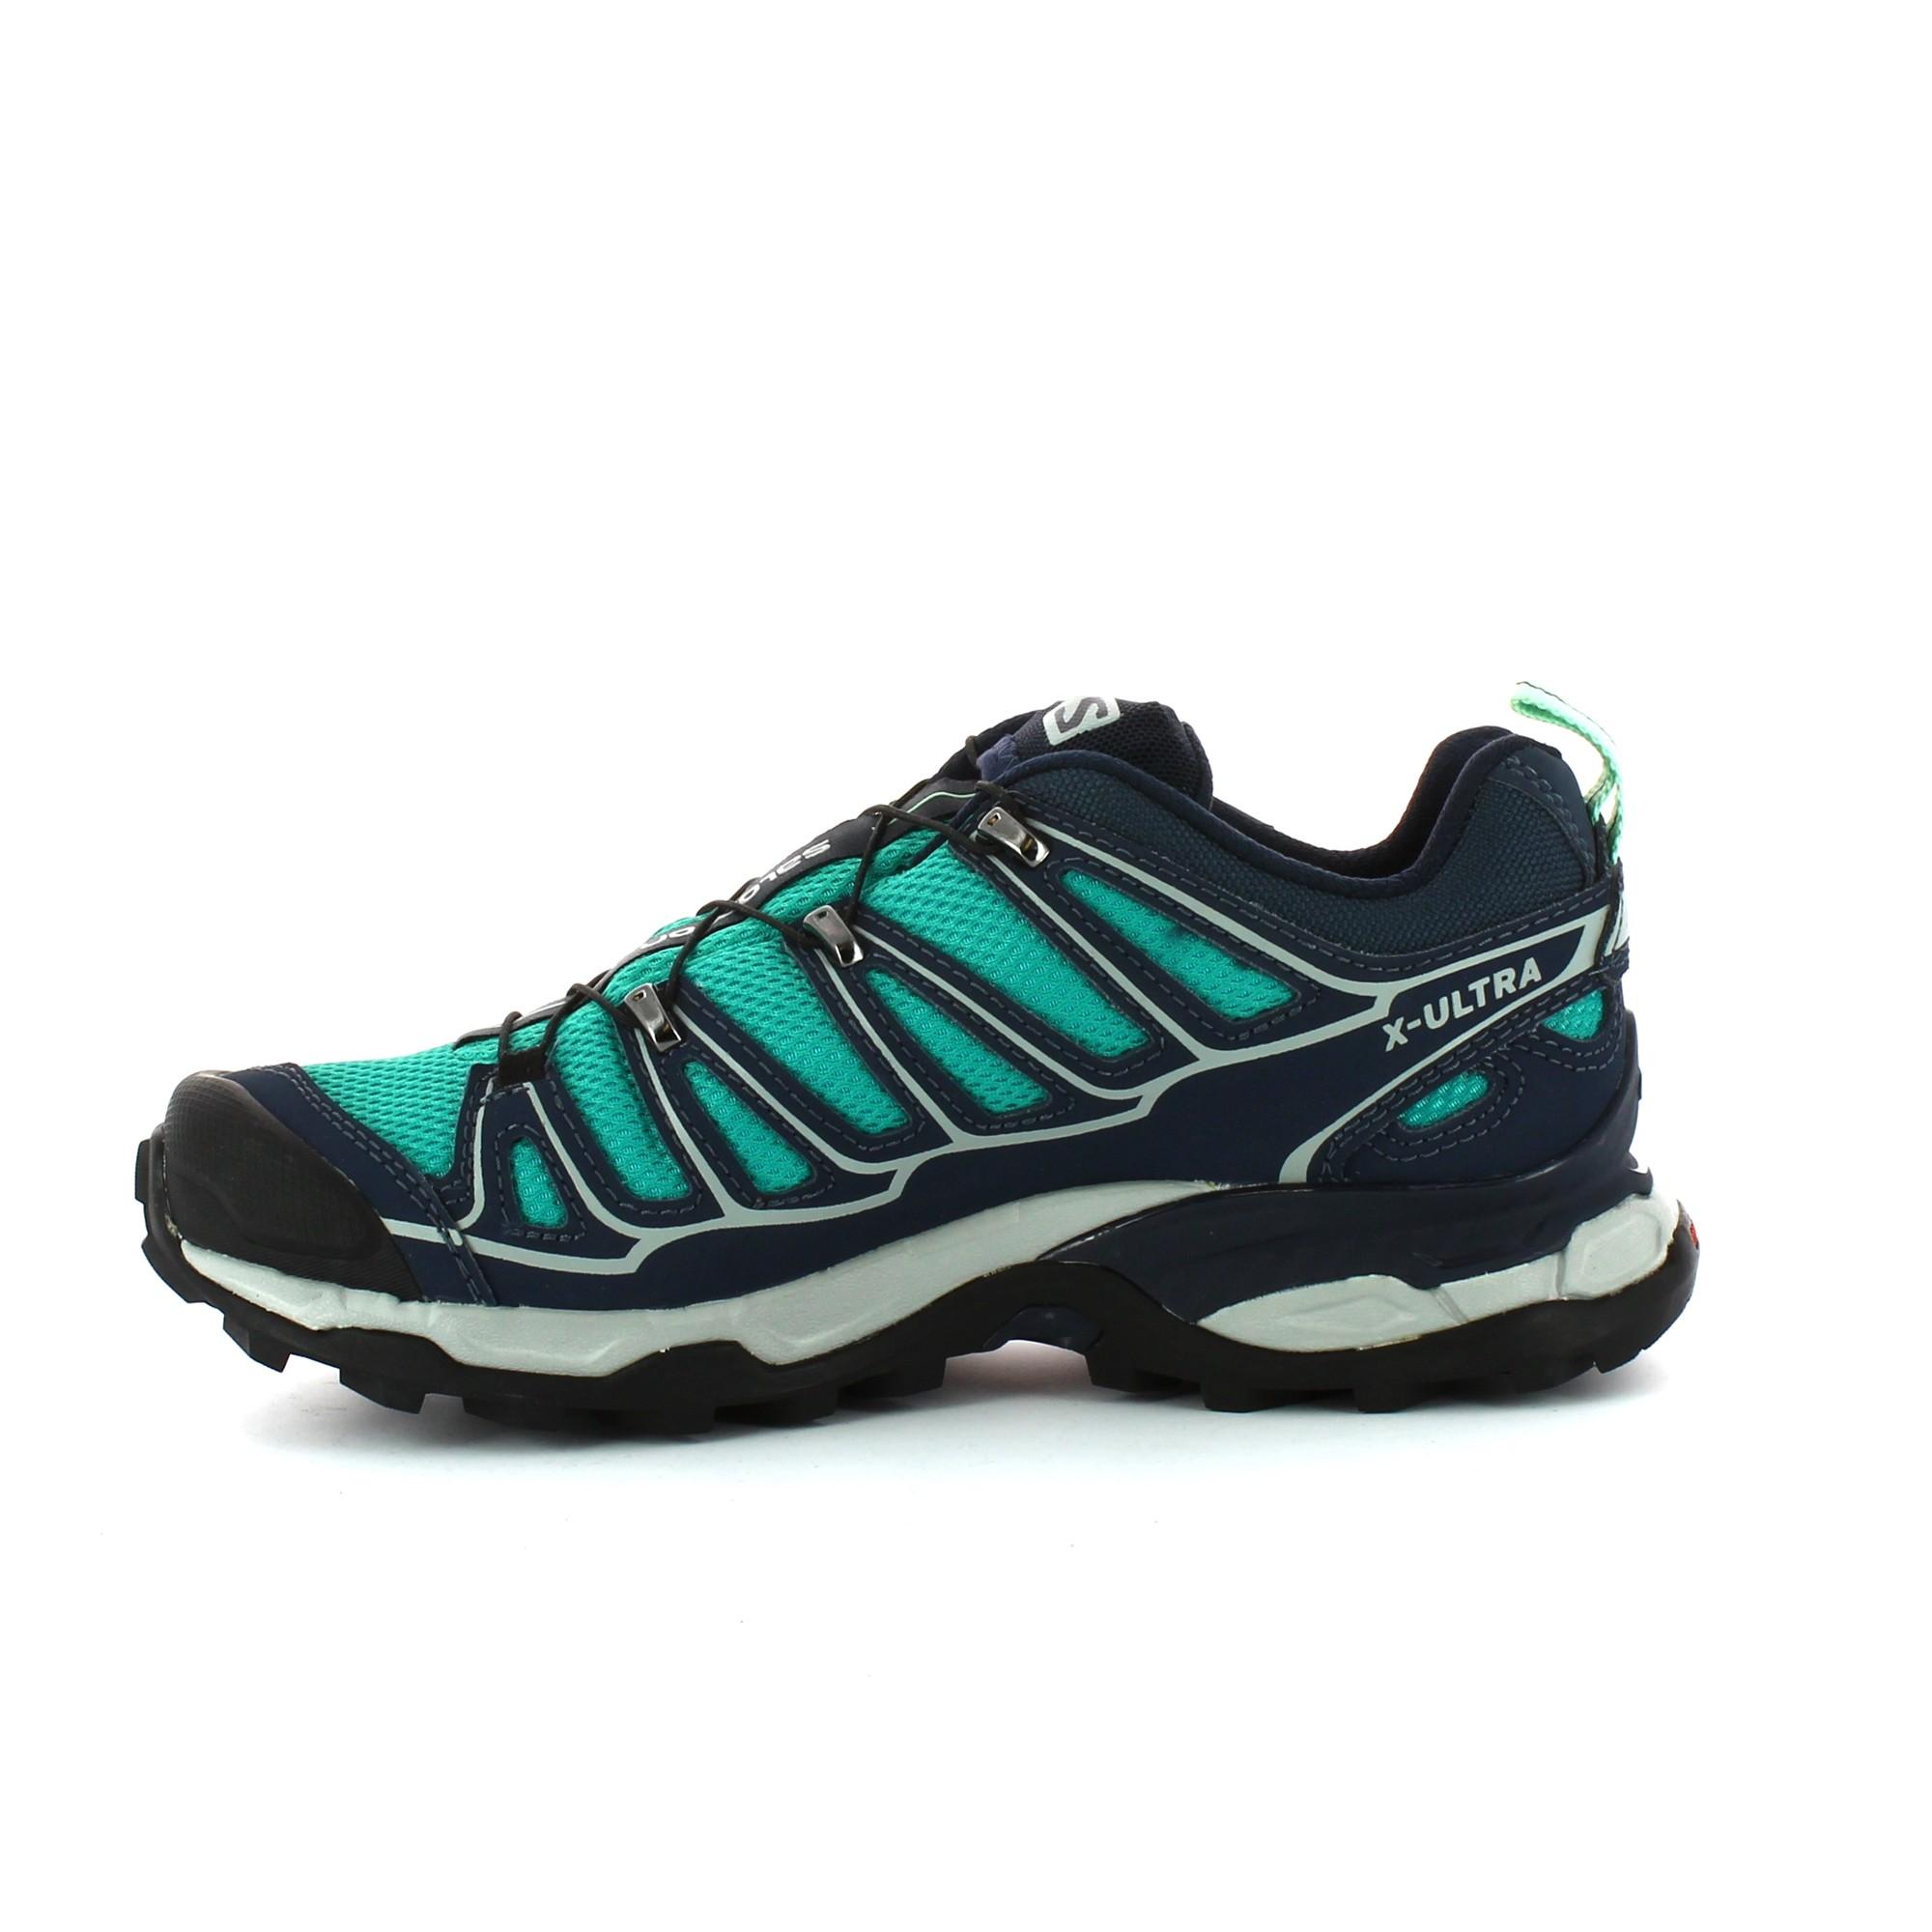 b40dd3c63e8ca Zapatillas Trekking Salomon X Ultra 2 Gtx W Verde Mujer - Deportes Moya